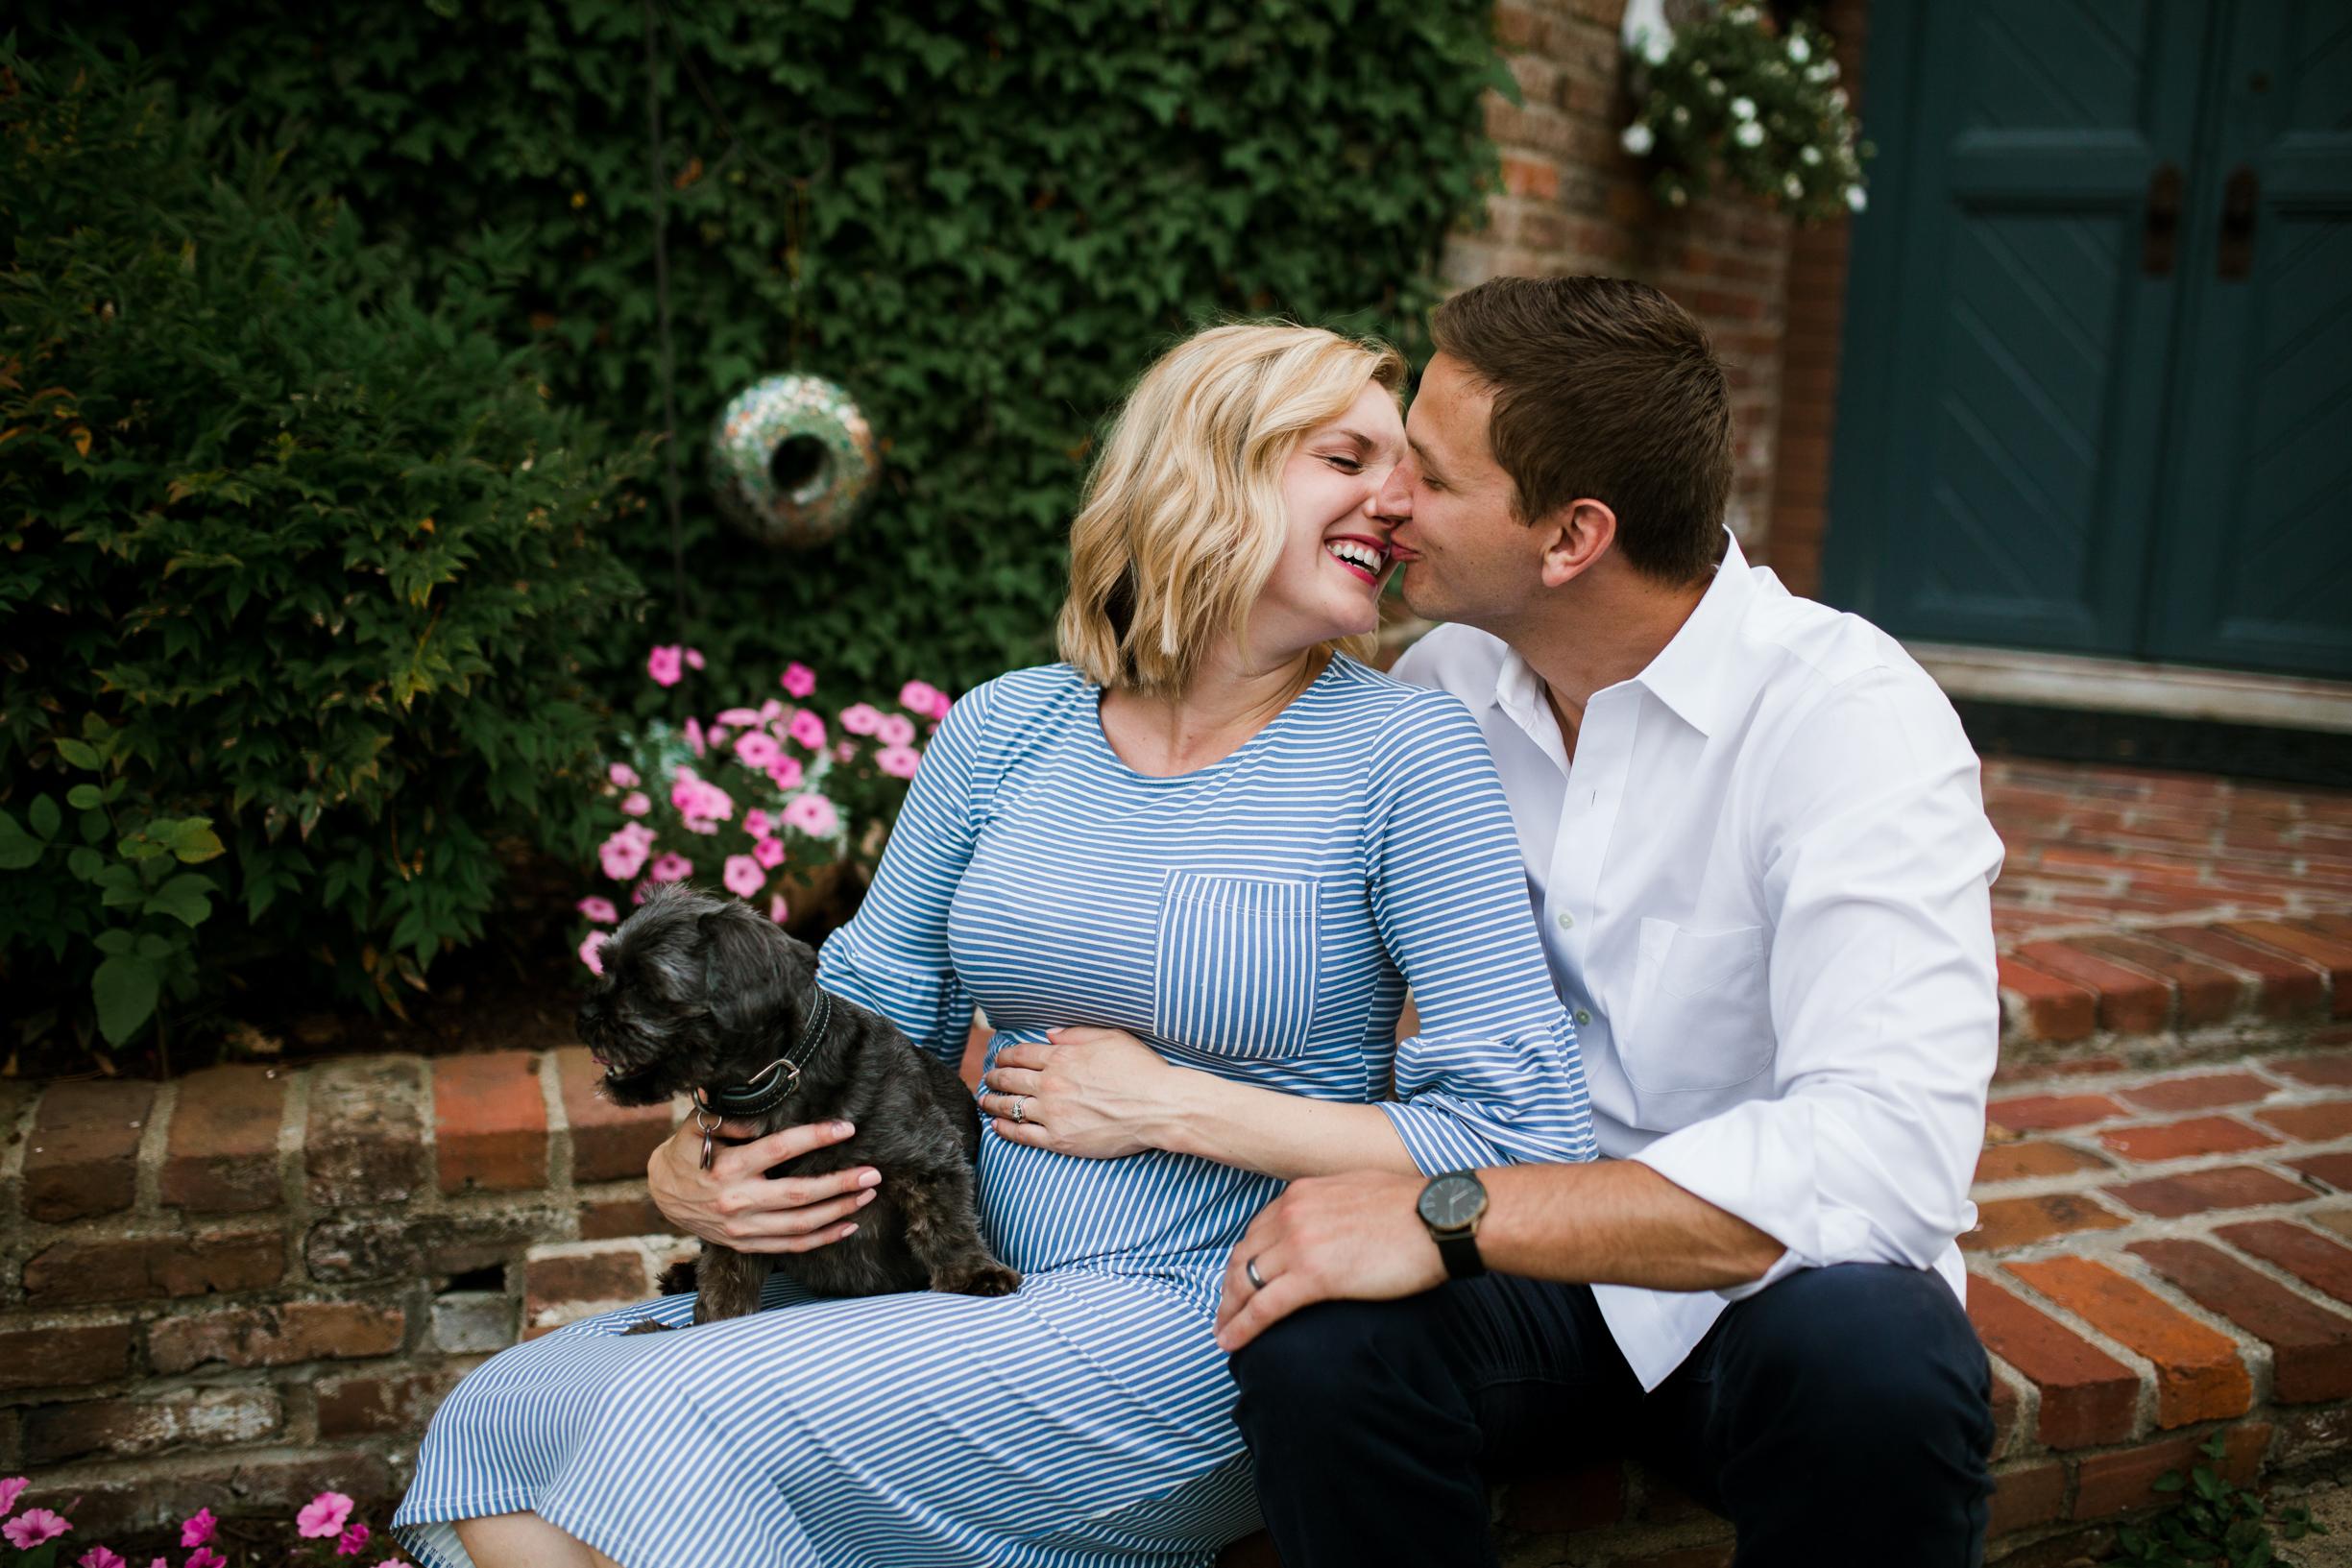 Sam, Wes, Tuck & Sloane Baby Bump 2018 Crystal Ludwick Photo WEBSITE (28 of 47).jpg